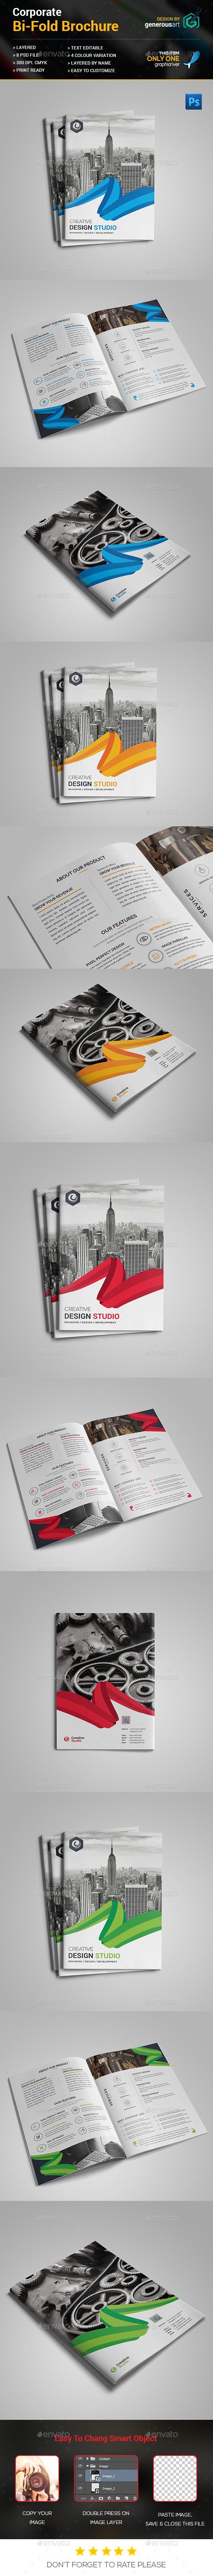 Bi-Fold Business Brochure Template - Brochures Print Templates